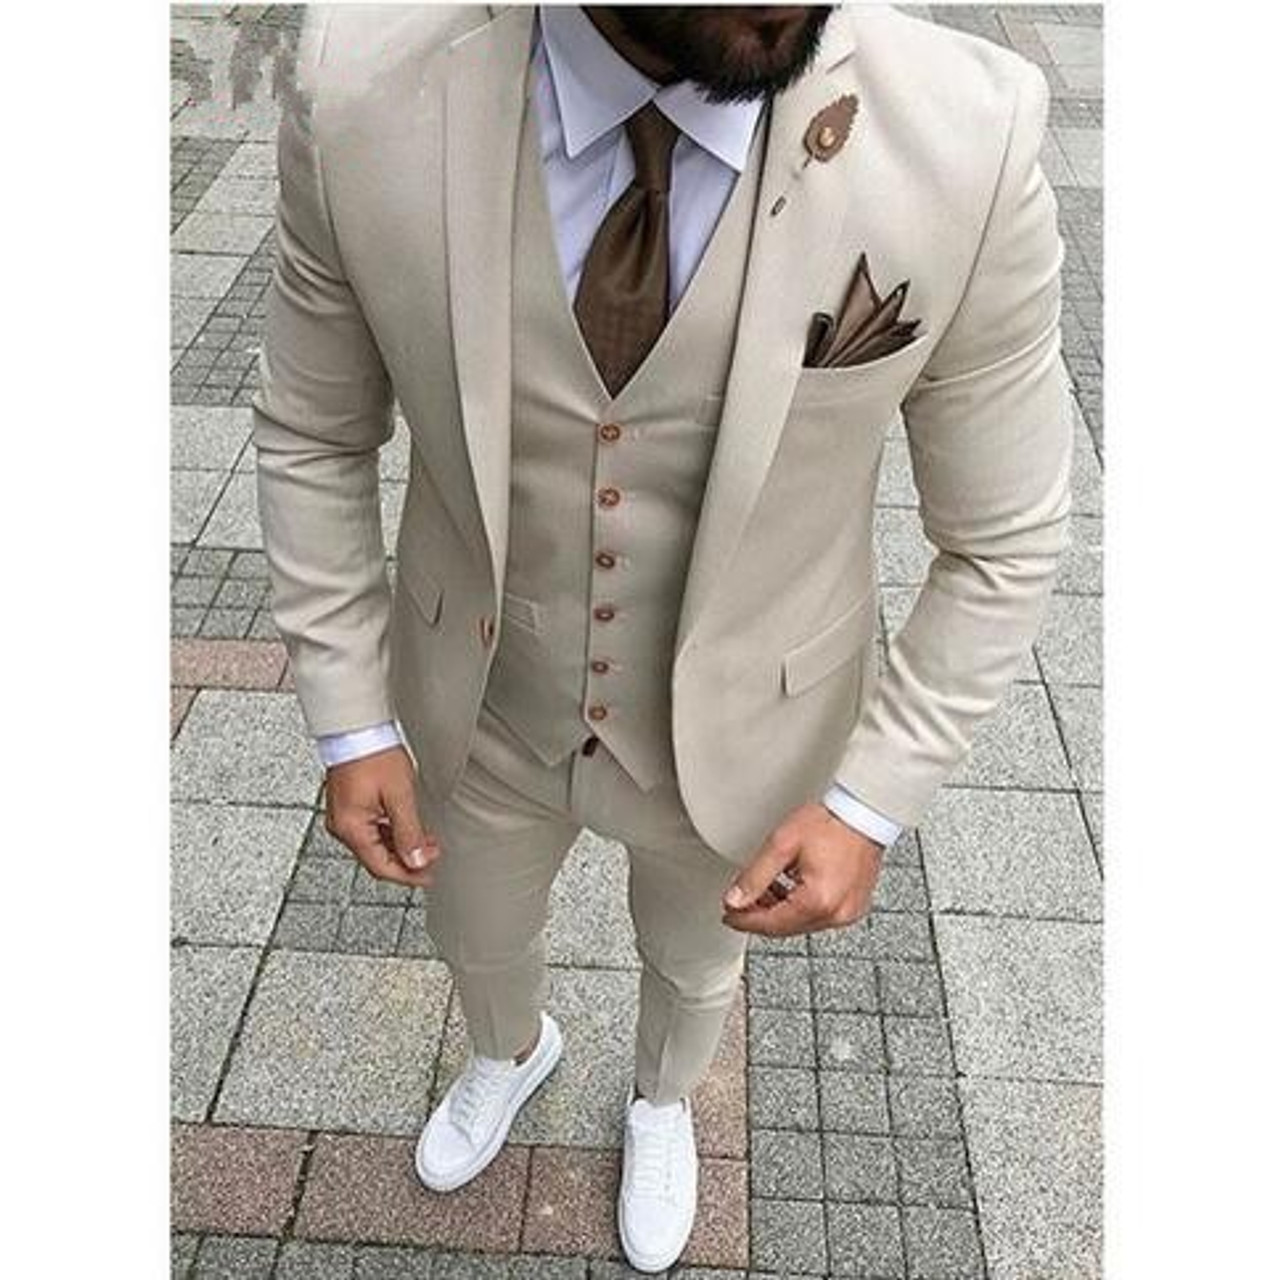 dd55836ea385 ... 2018 Latest Designs Beige Men Wedding Suit Groomsmen Tuxedo Slim Fit  Three Piece Groom Wear Mens ...